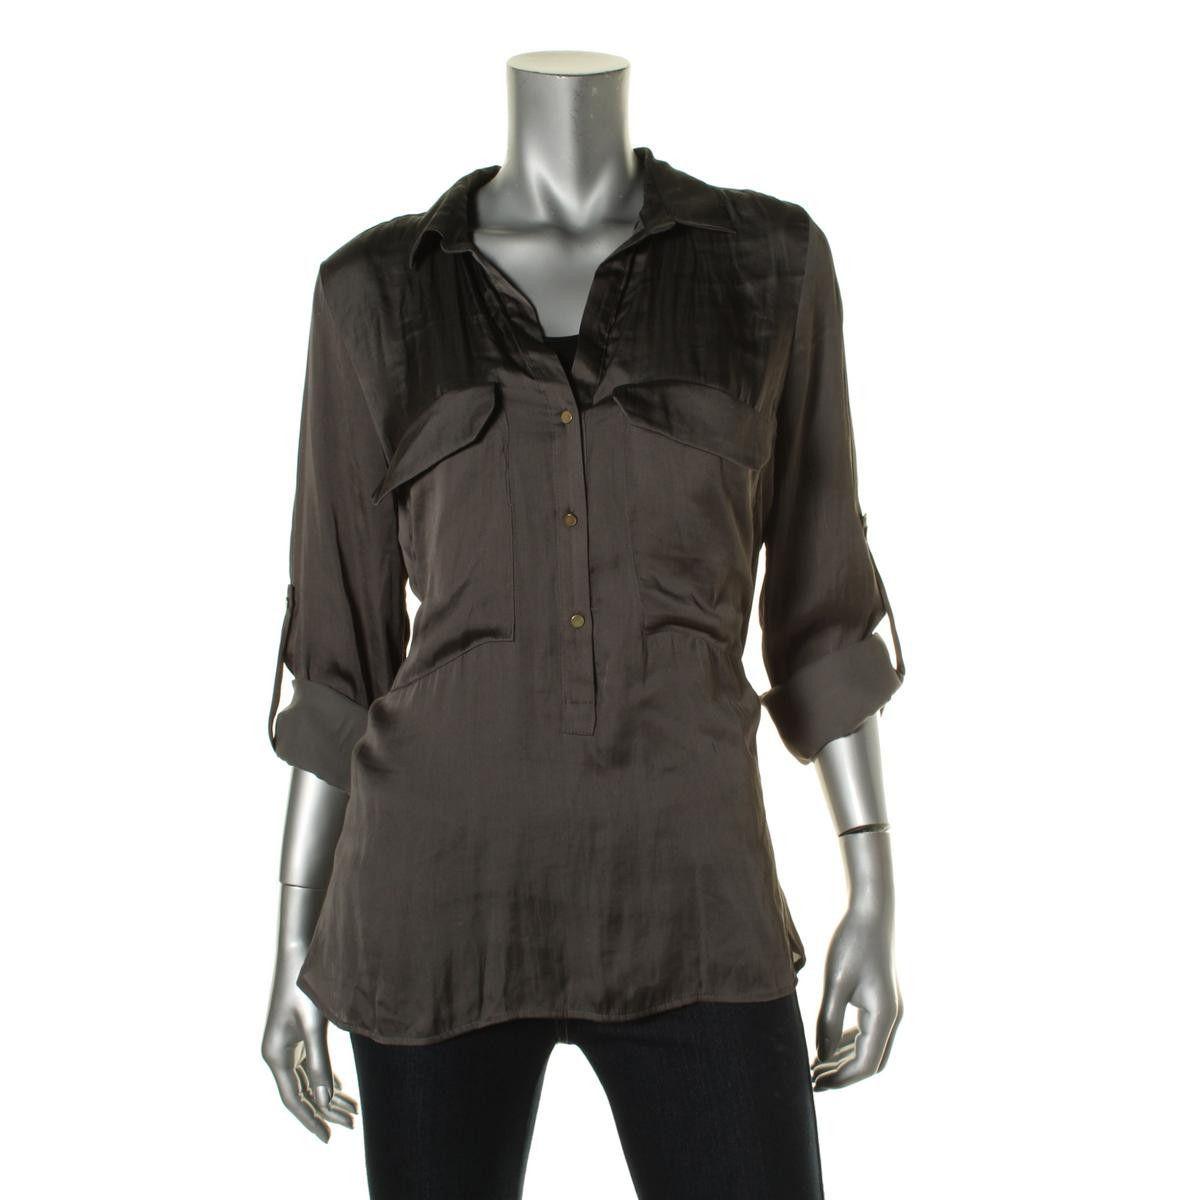 Zara Womens Adjustable Sleeves Casual Pullover Top